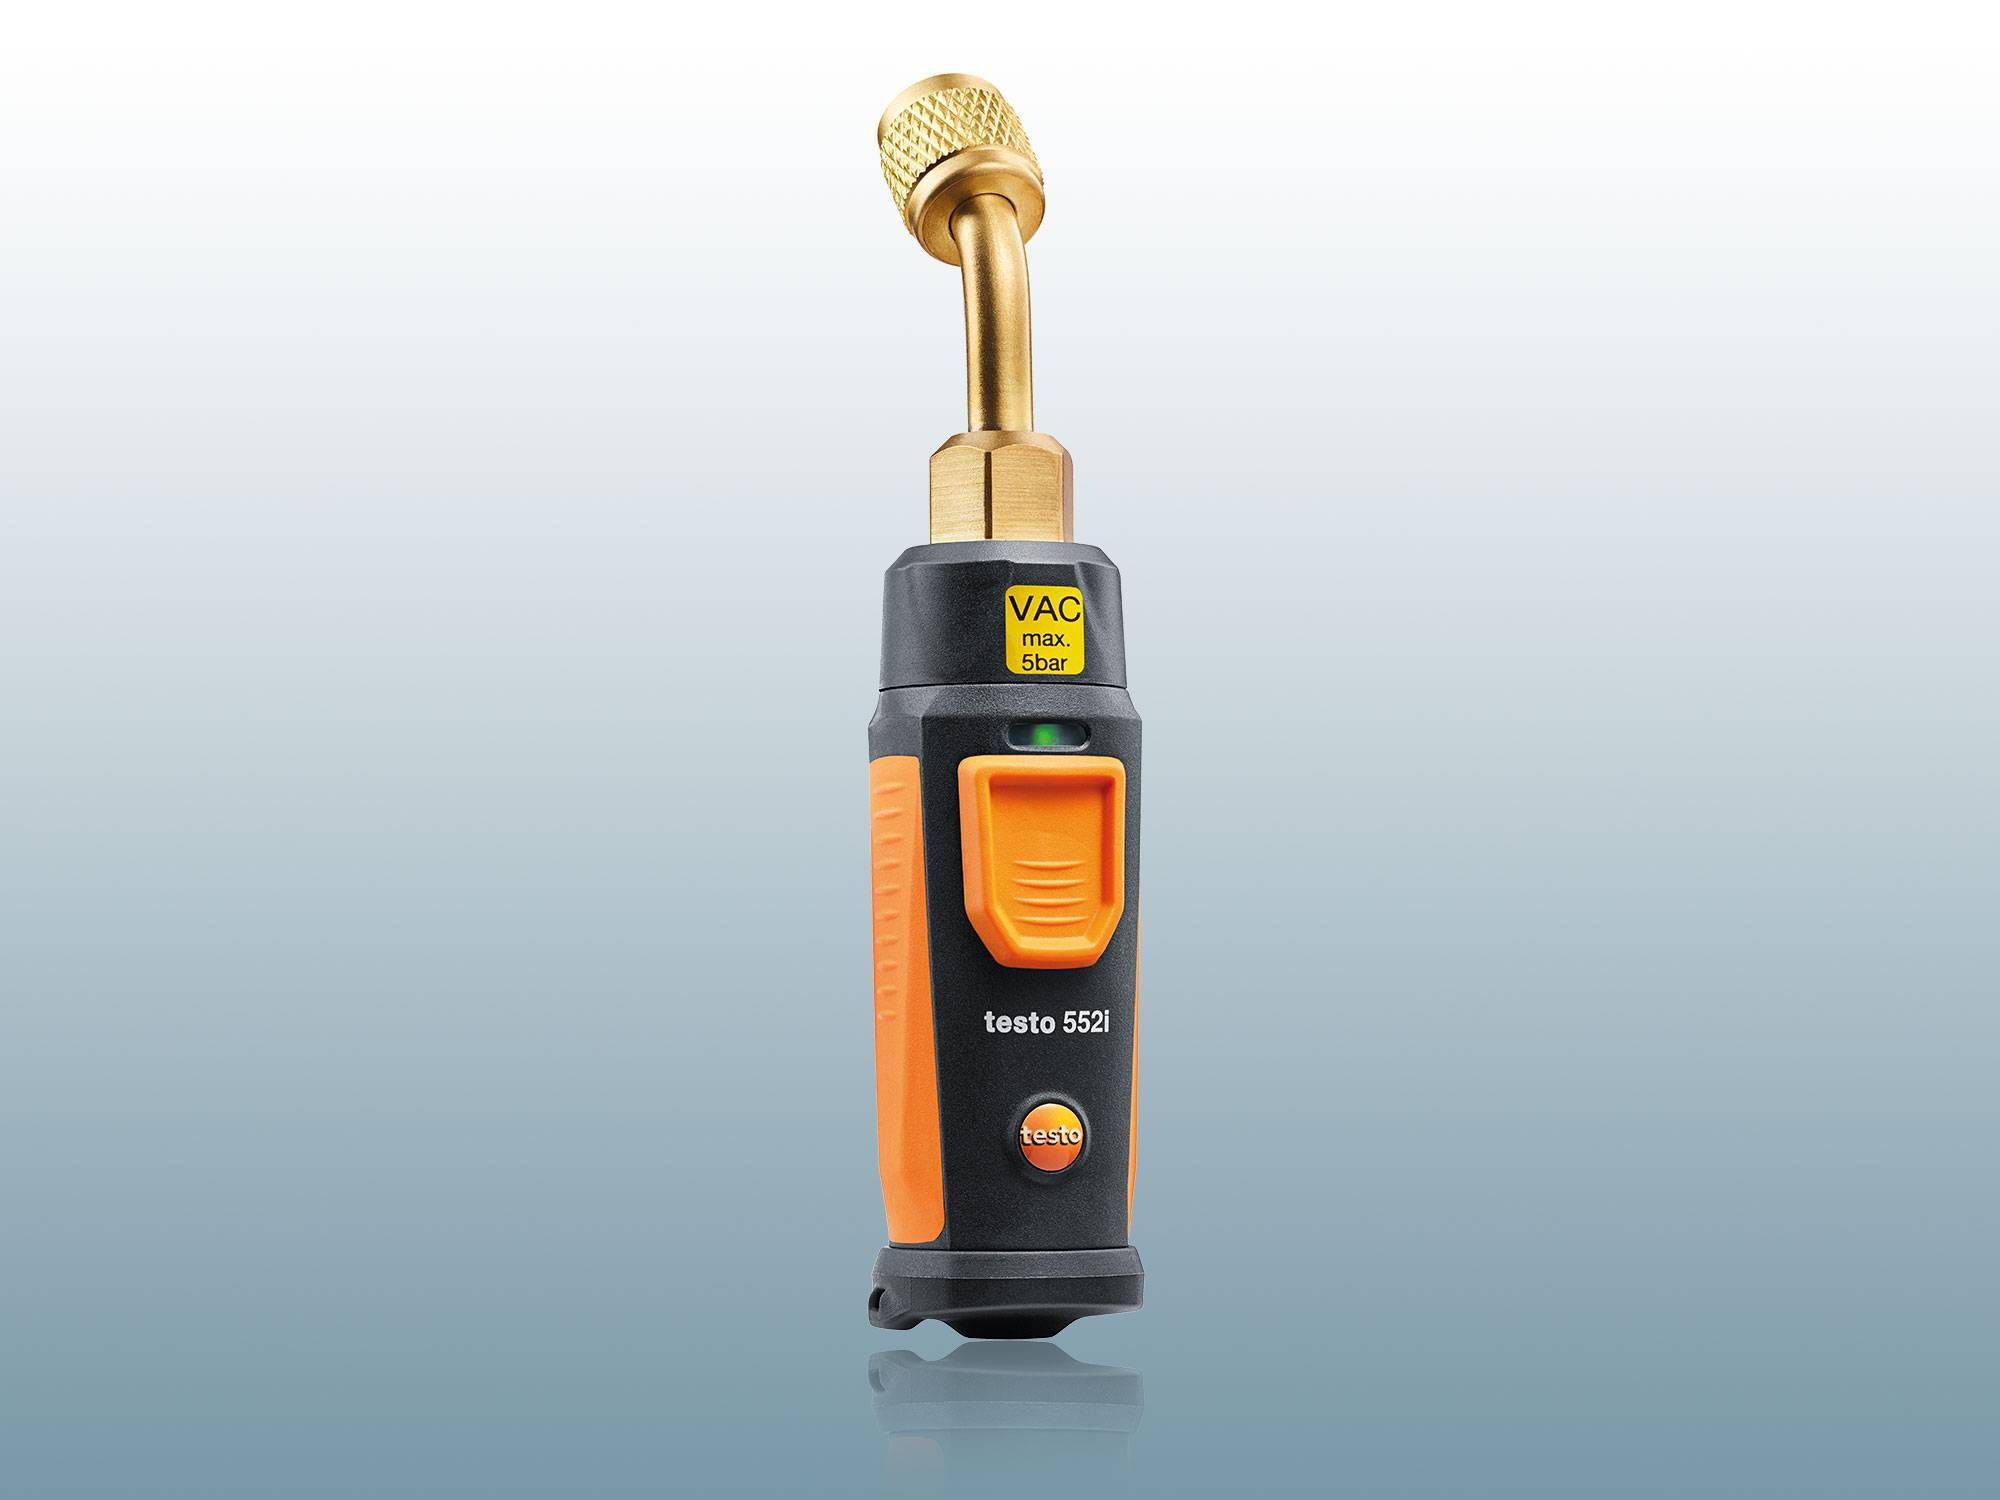 POP-Smart-Probes-testo-552i-2000x1500.jpg